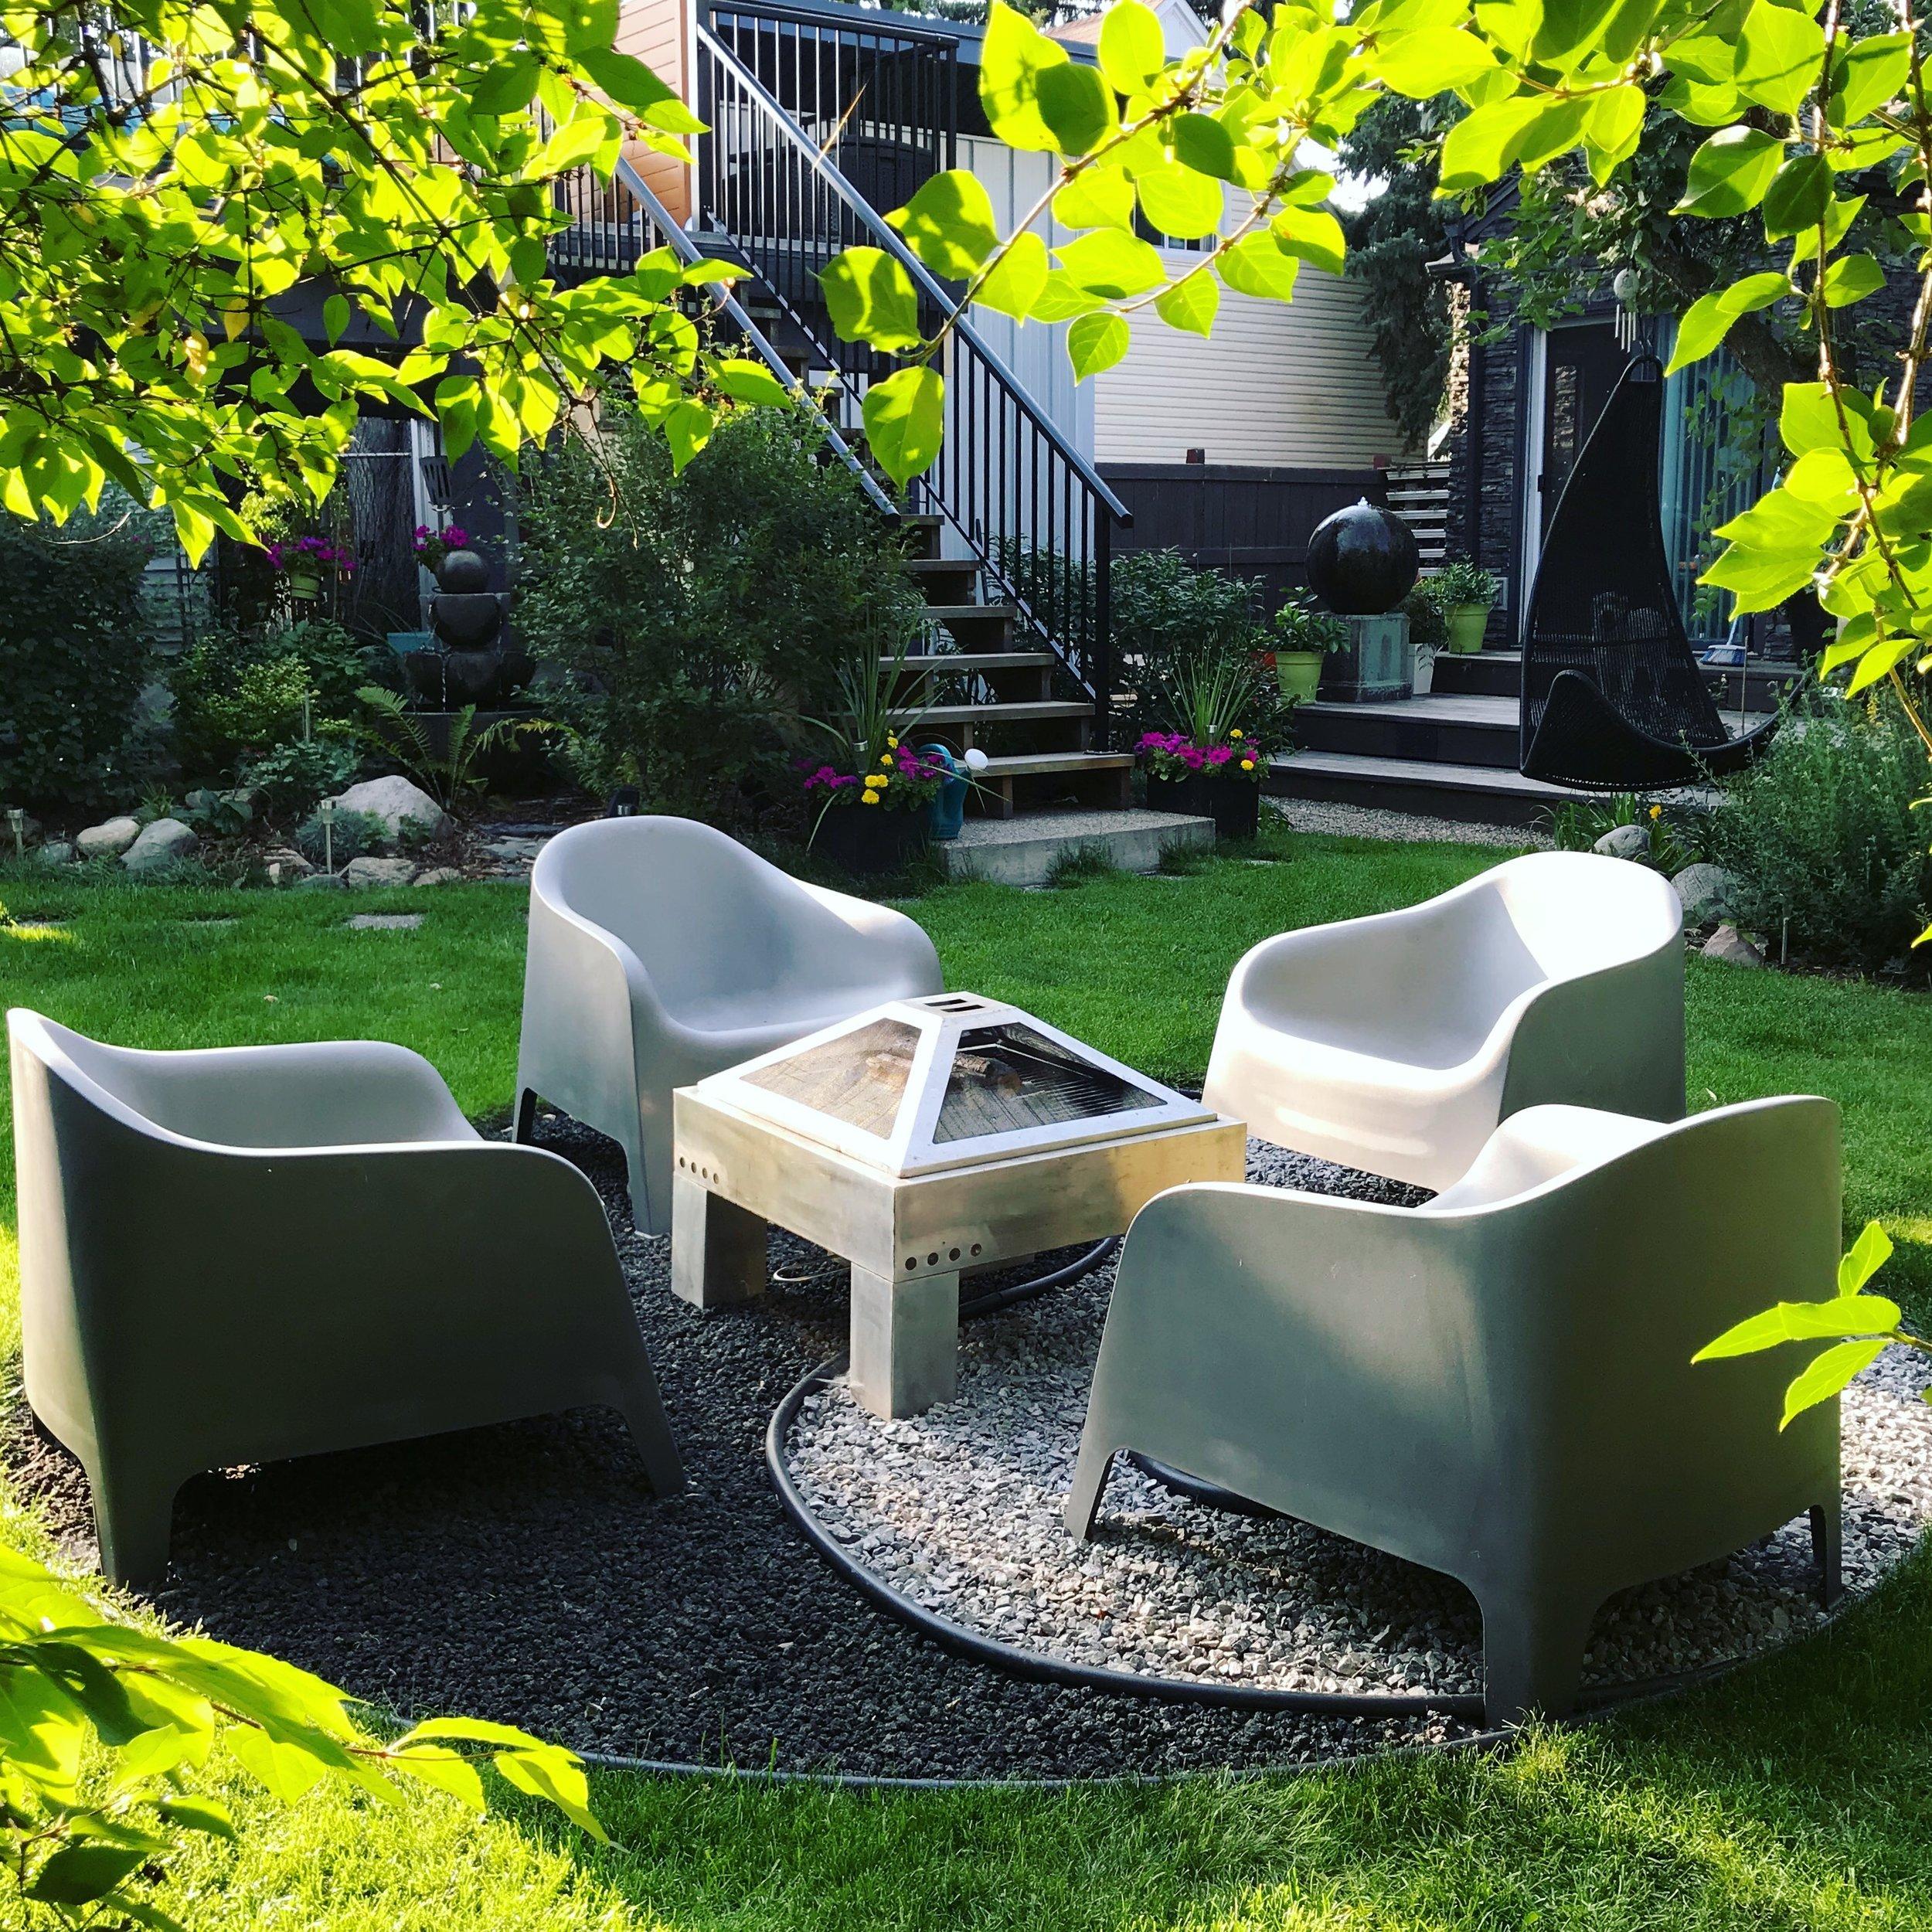 Yin Yang Fire Pit-Patio Furniture-Landscape Design-Style Maven Decor Interior Design-Edmonton Canada